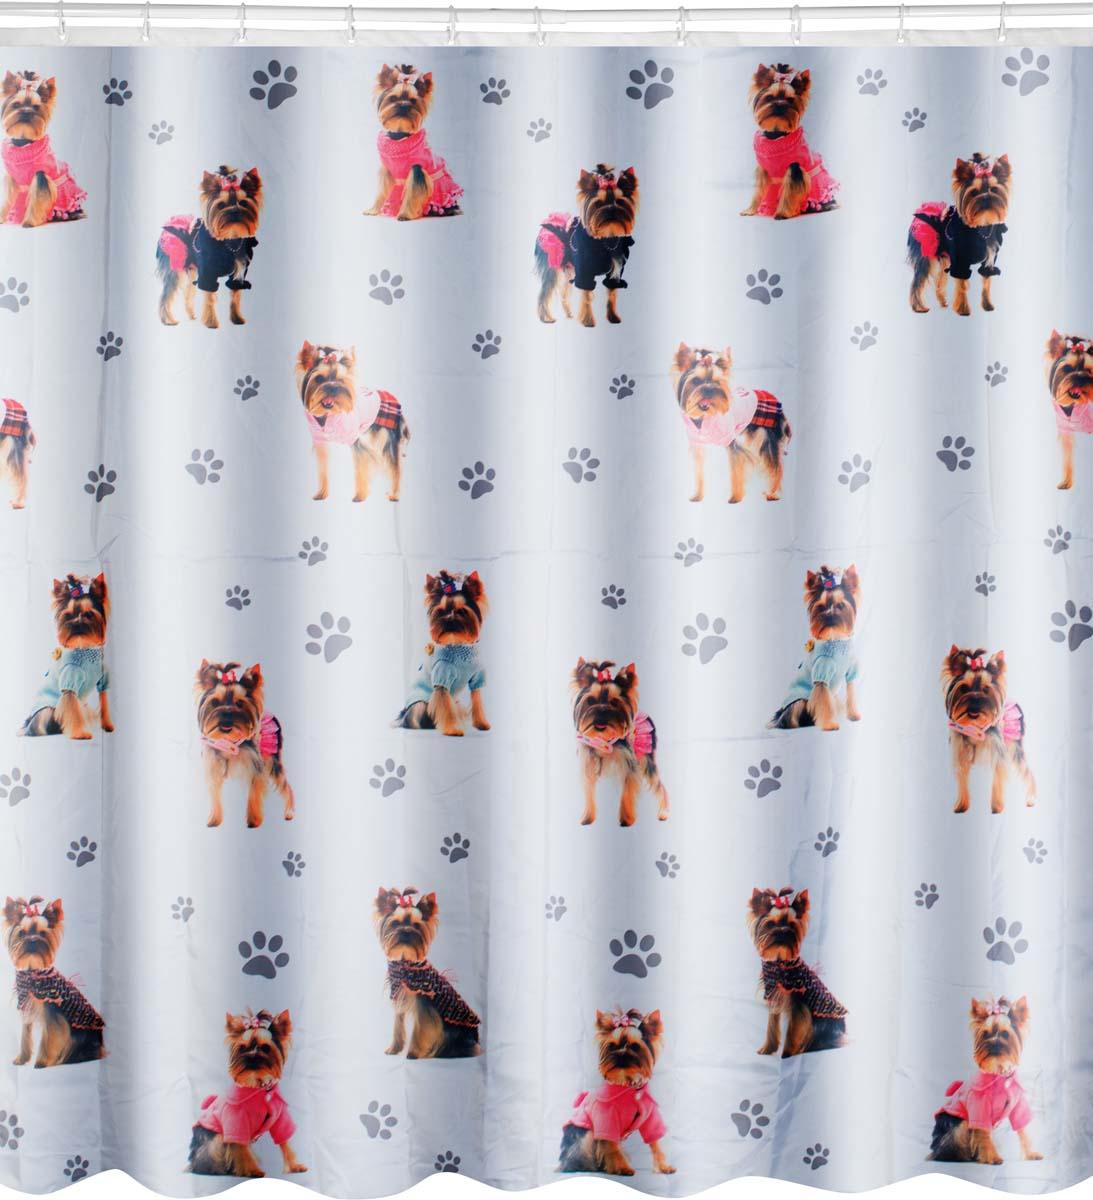 Штора для ванной Swensa York-Dog, 180 х 180 см штора для ванной swensa анкона цвет бежевый 180 х 180 см